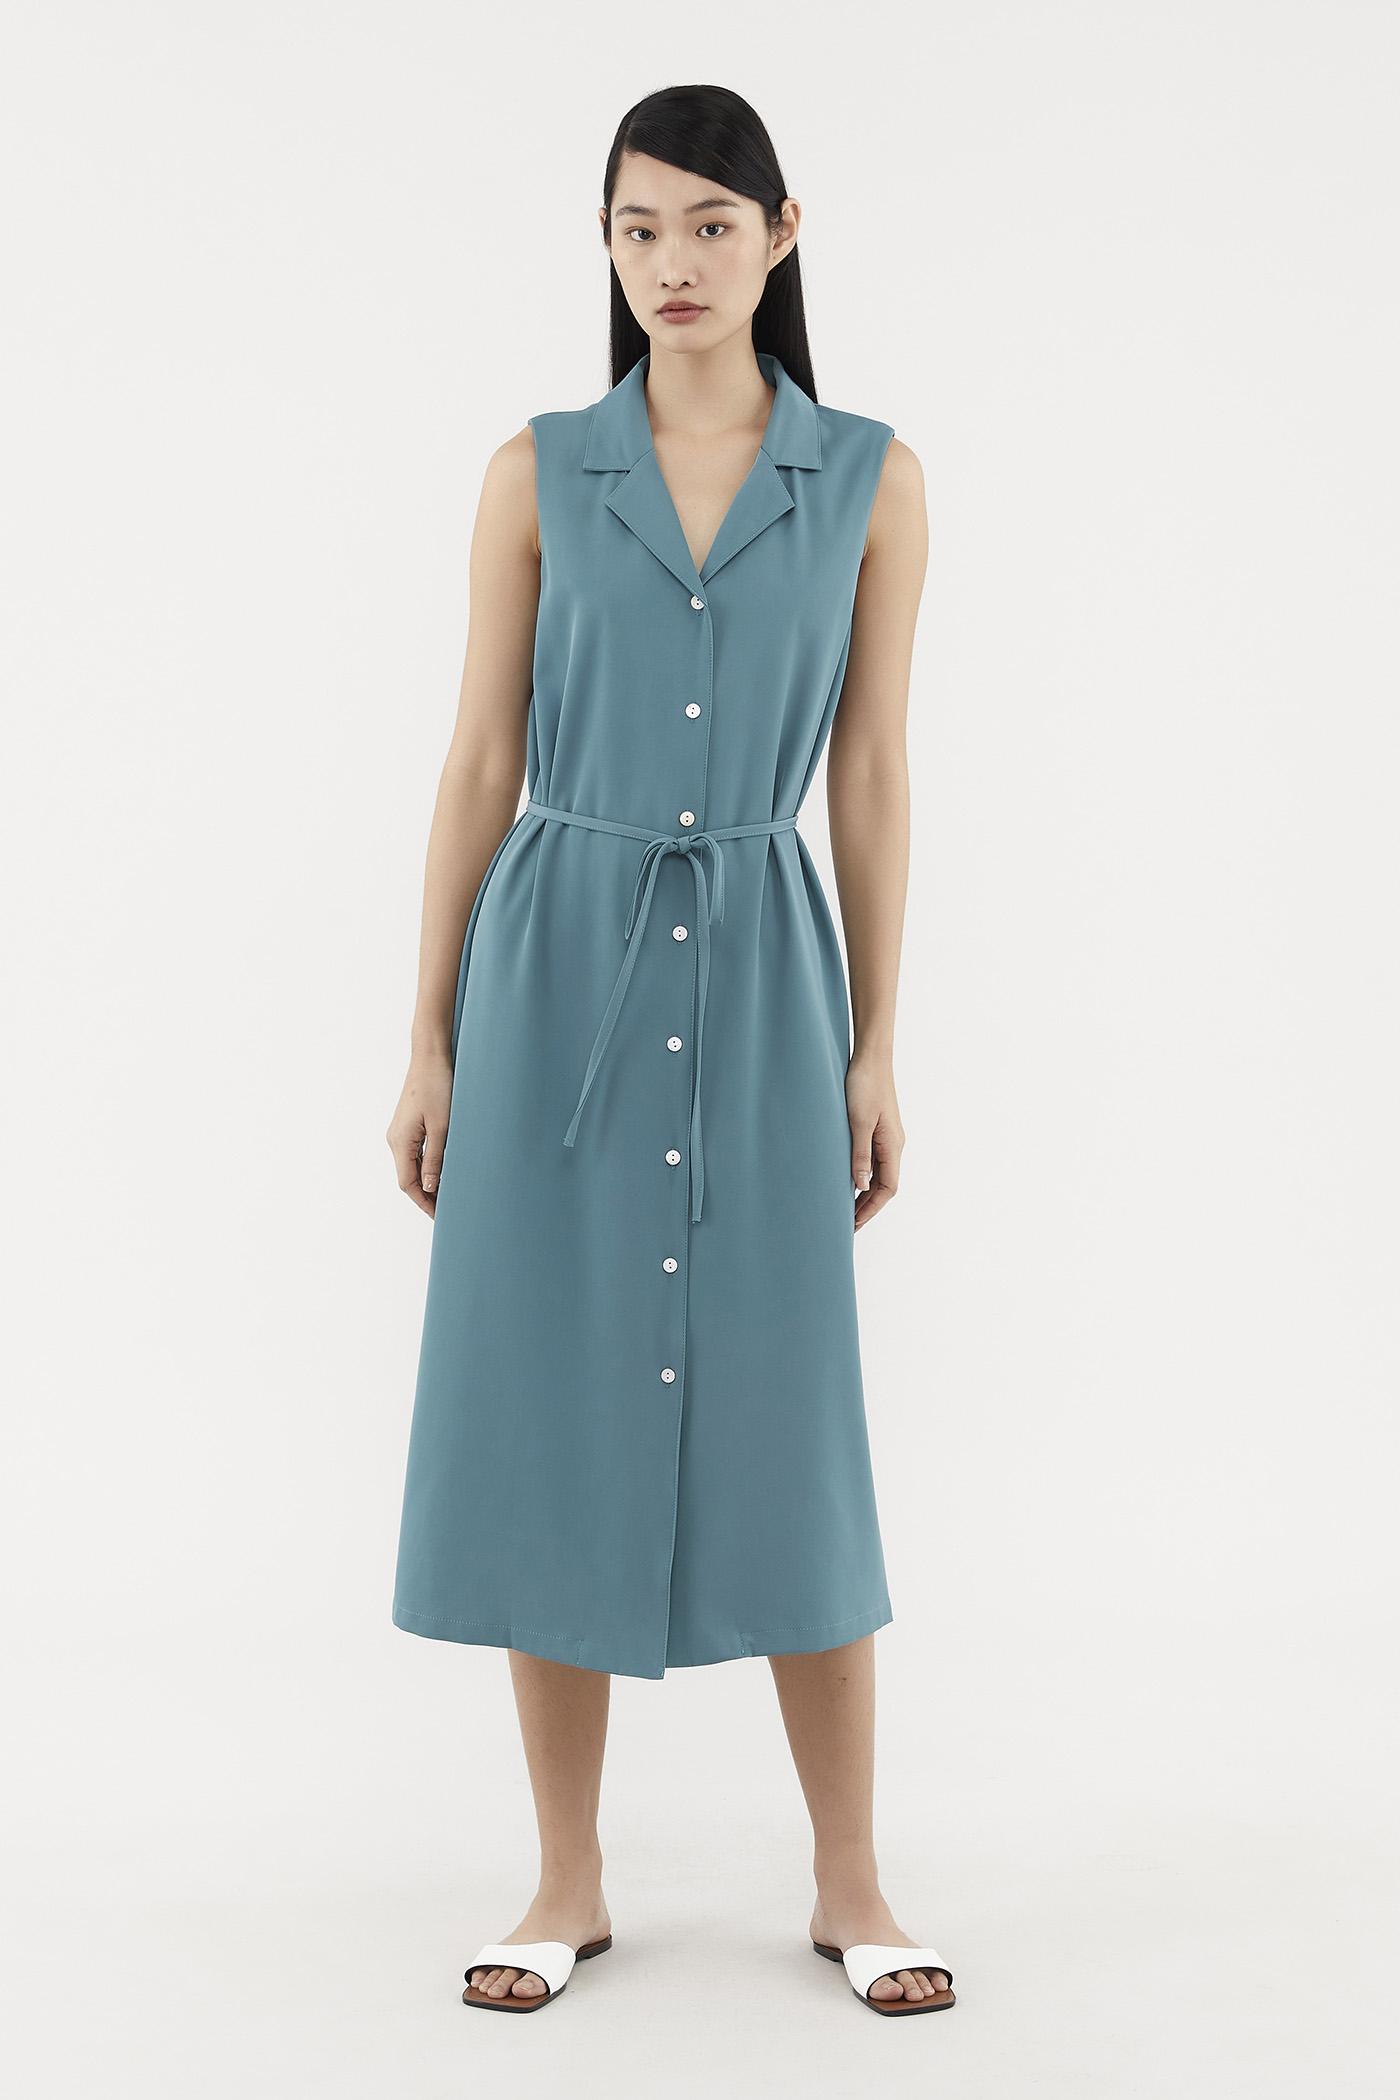 Julita Vest Dress